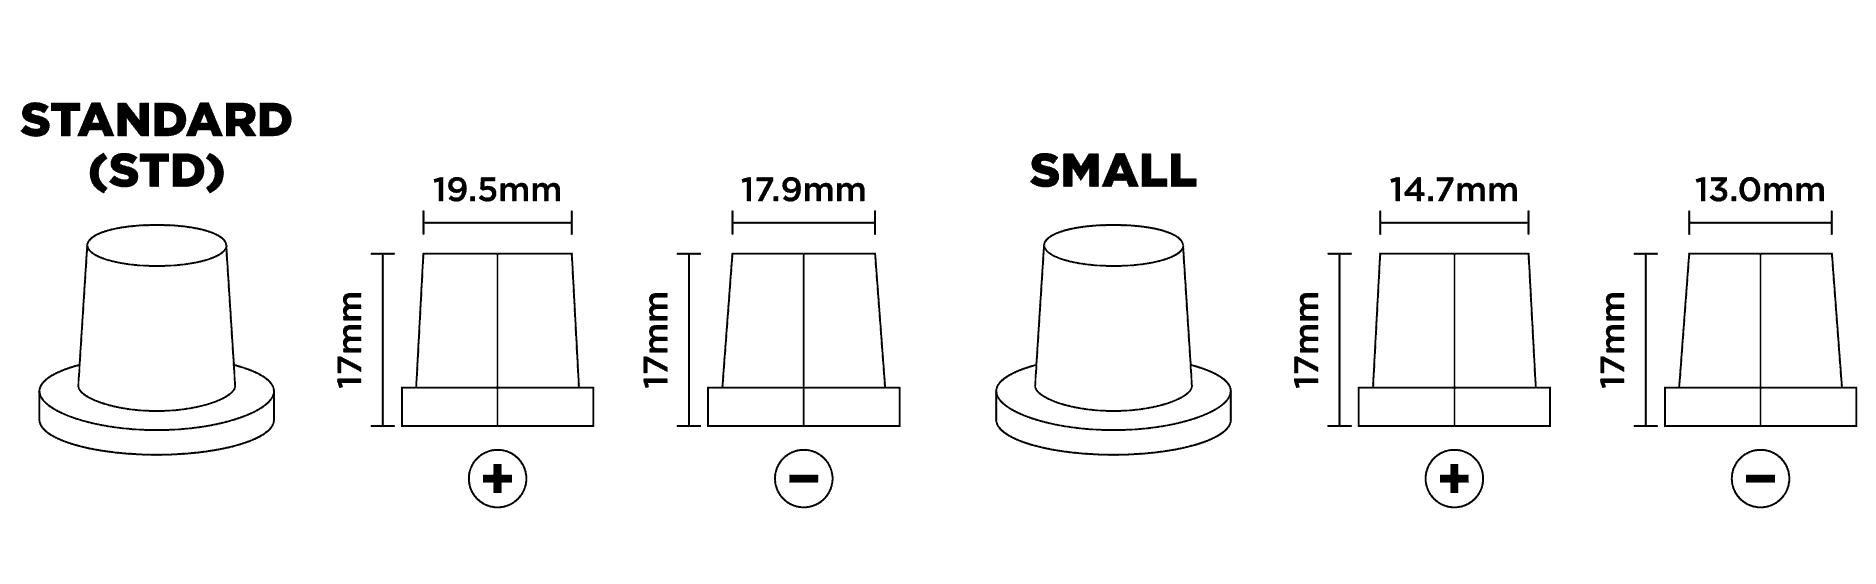 terminal-types